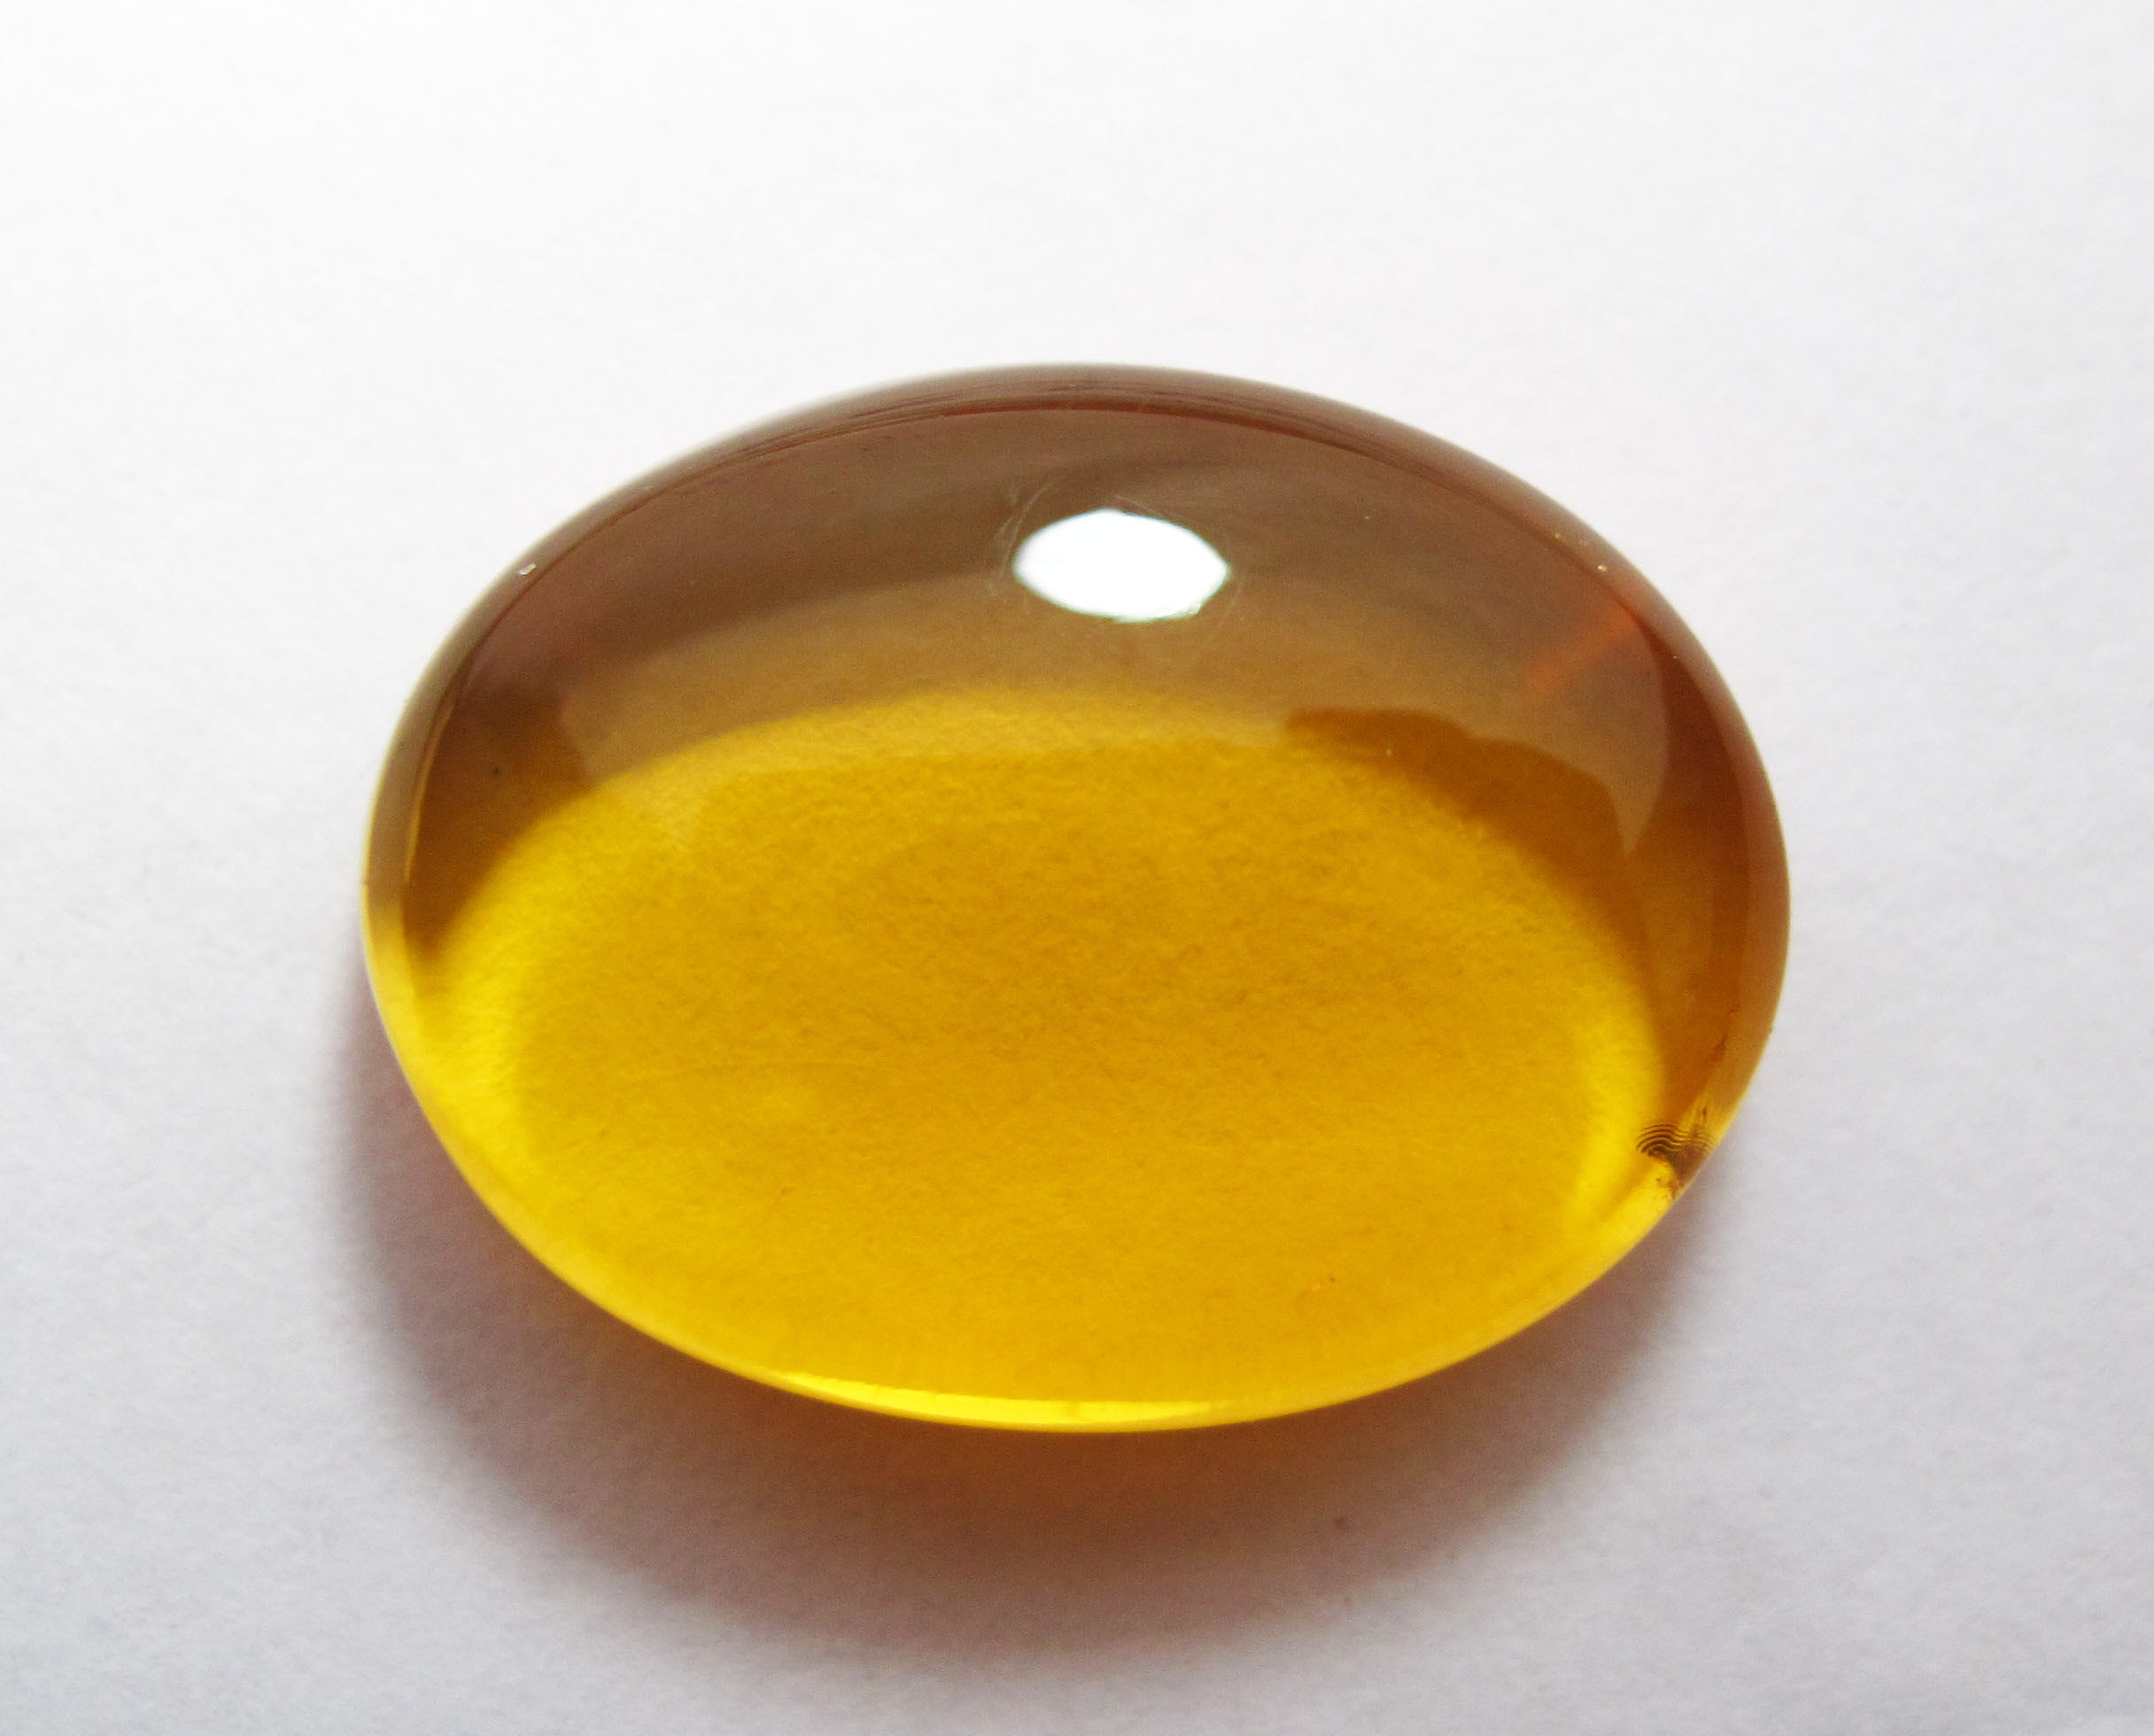 Oligo-miocene Chiapas amber from Mexico